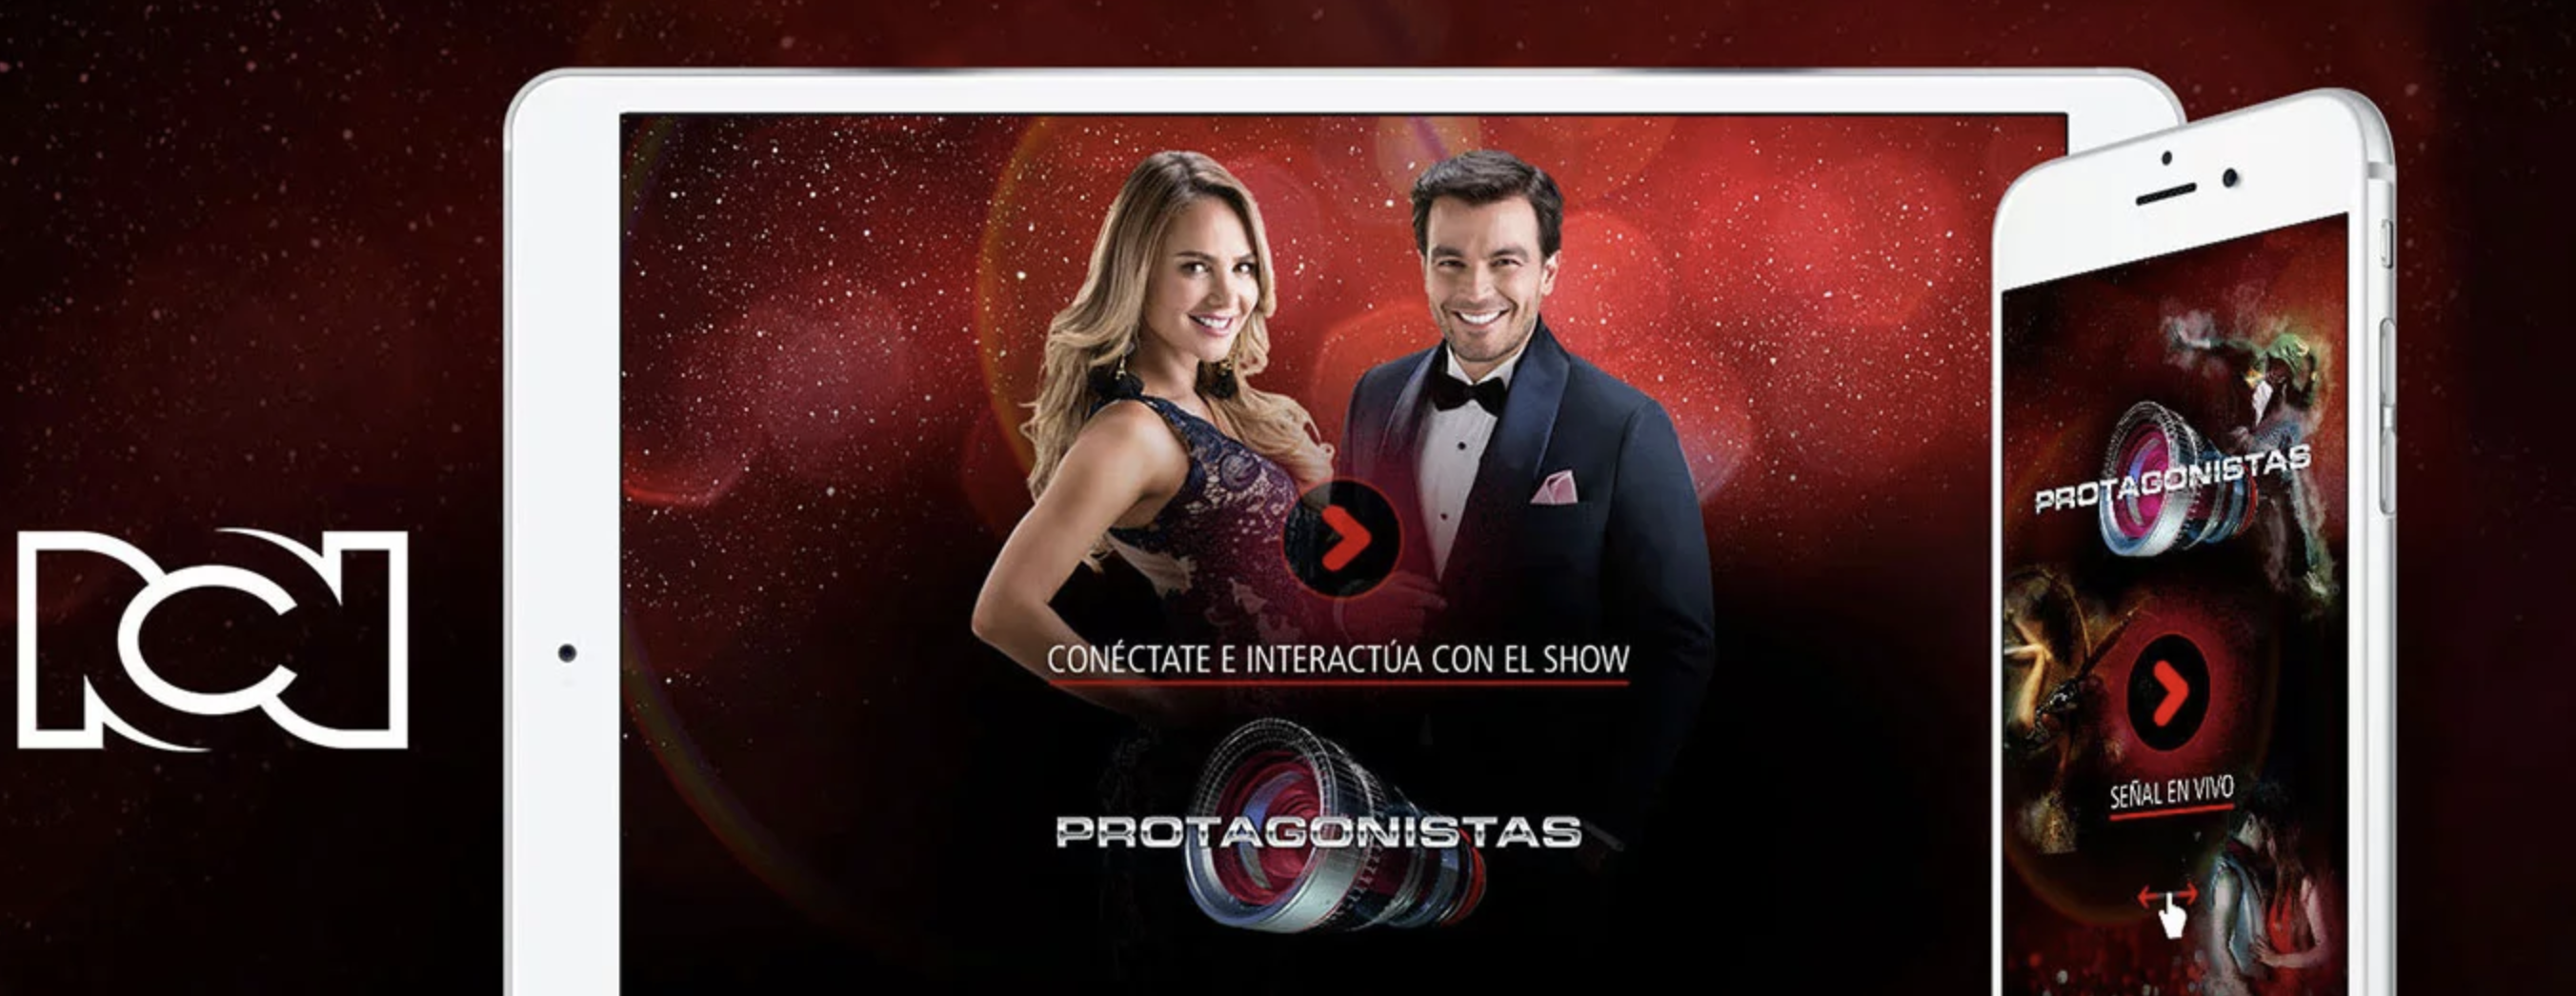 Protagonistas app for RCN | Applicaster